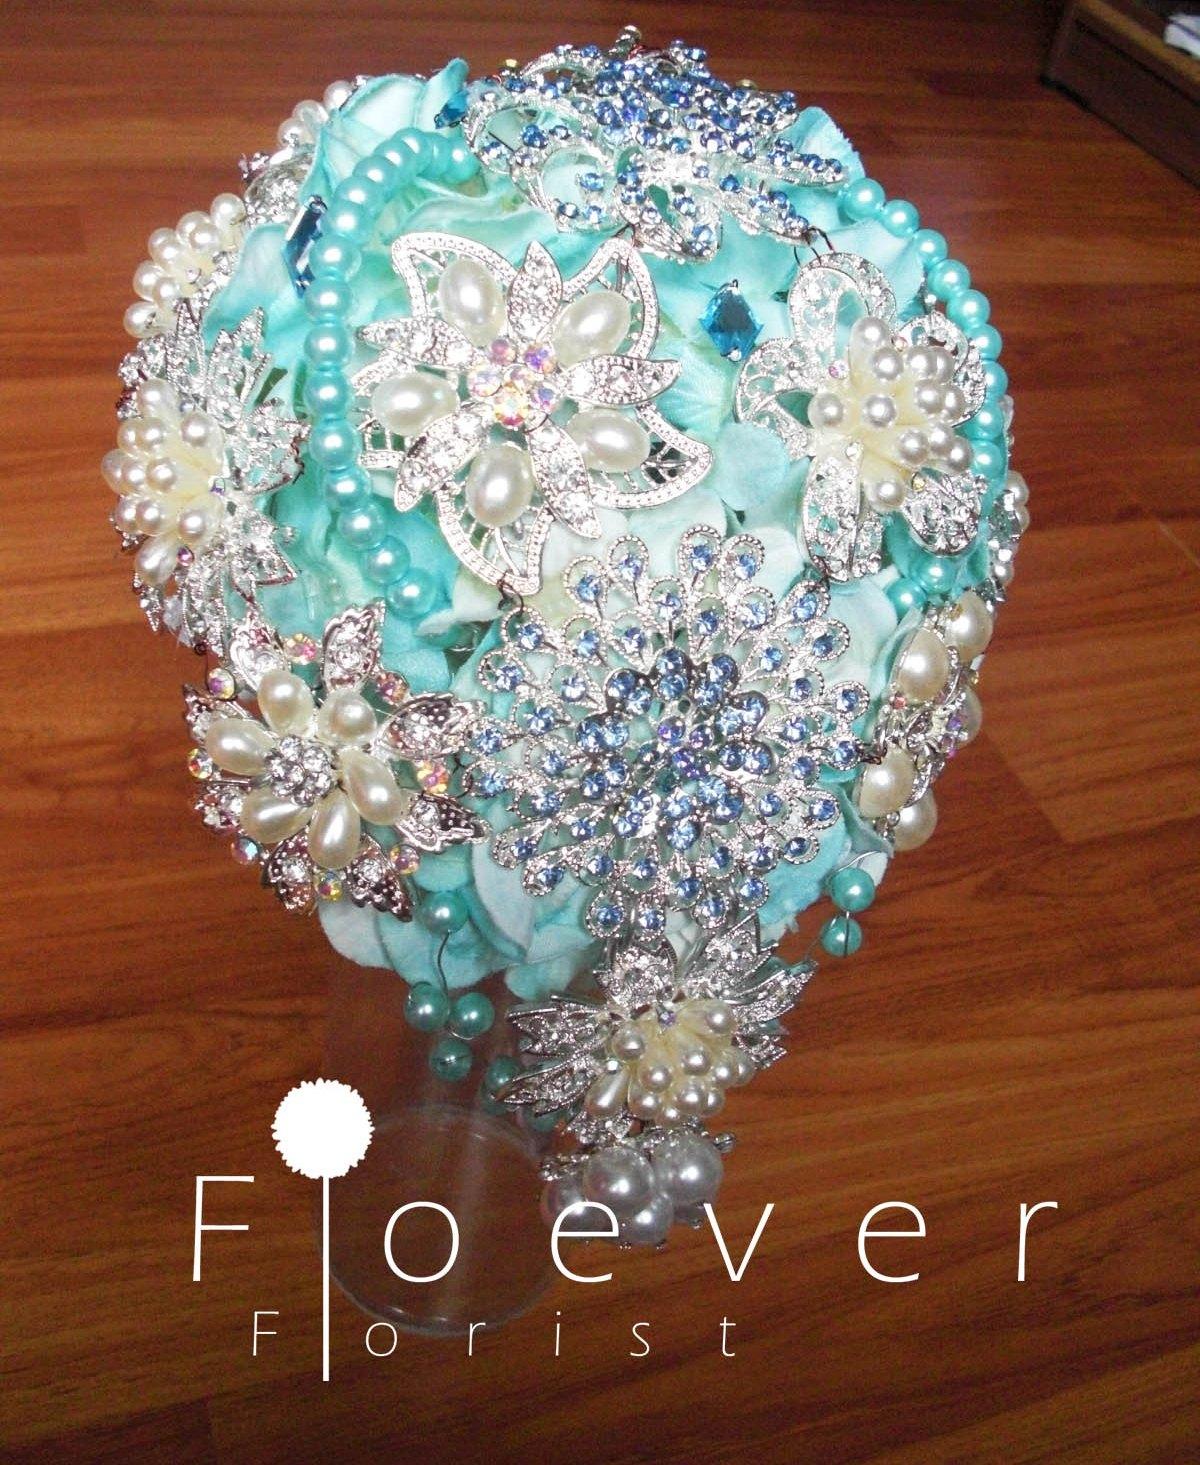 Floever Florist Tiffany Blue Jewel Bouquet